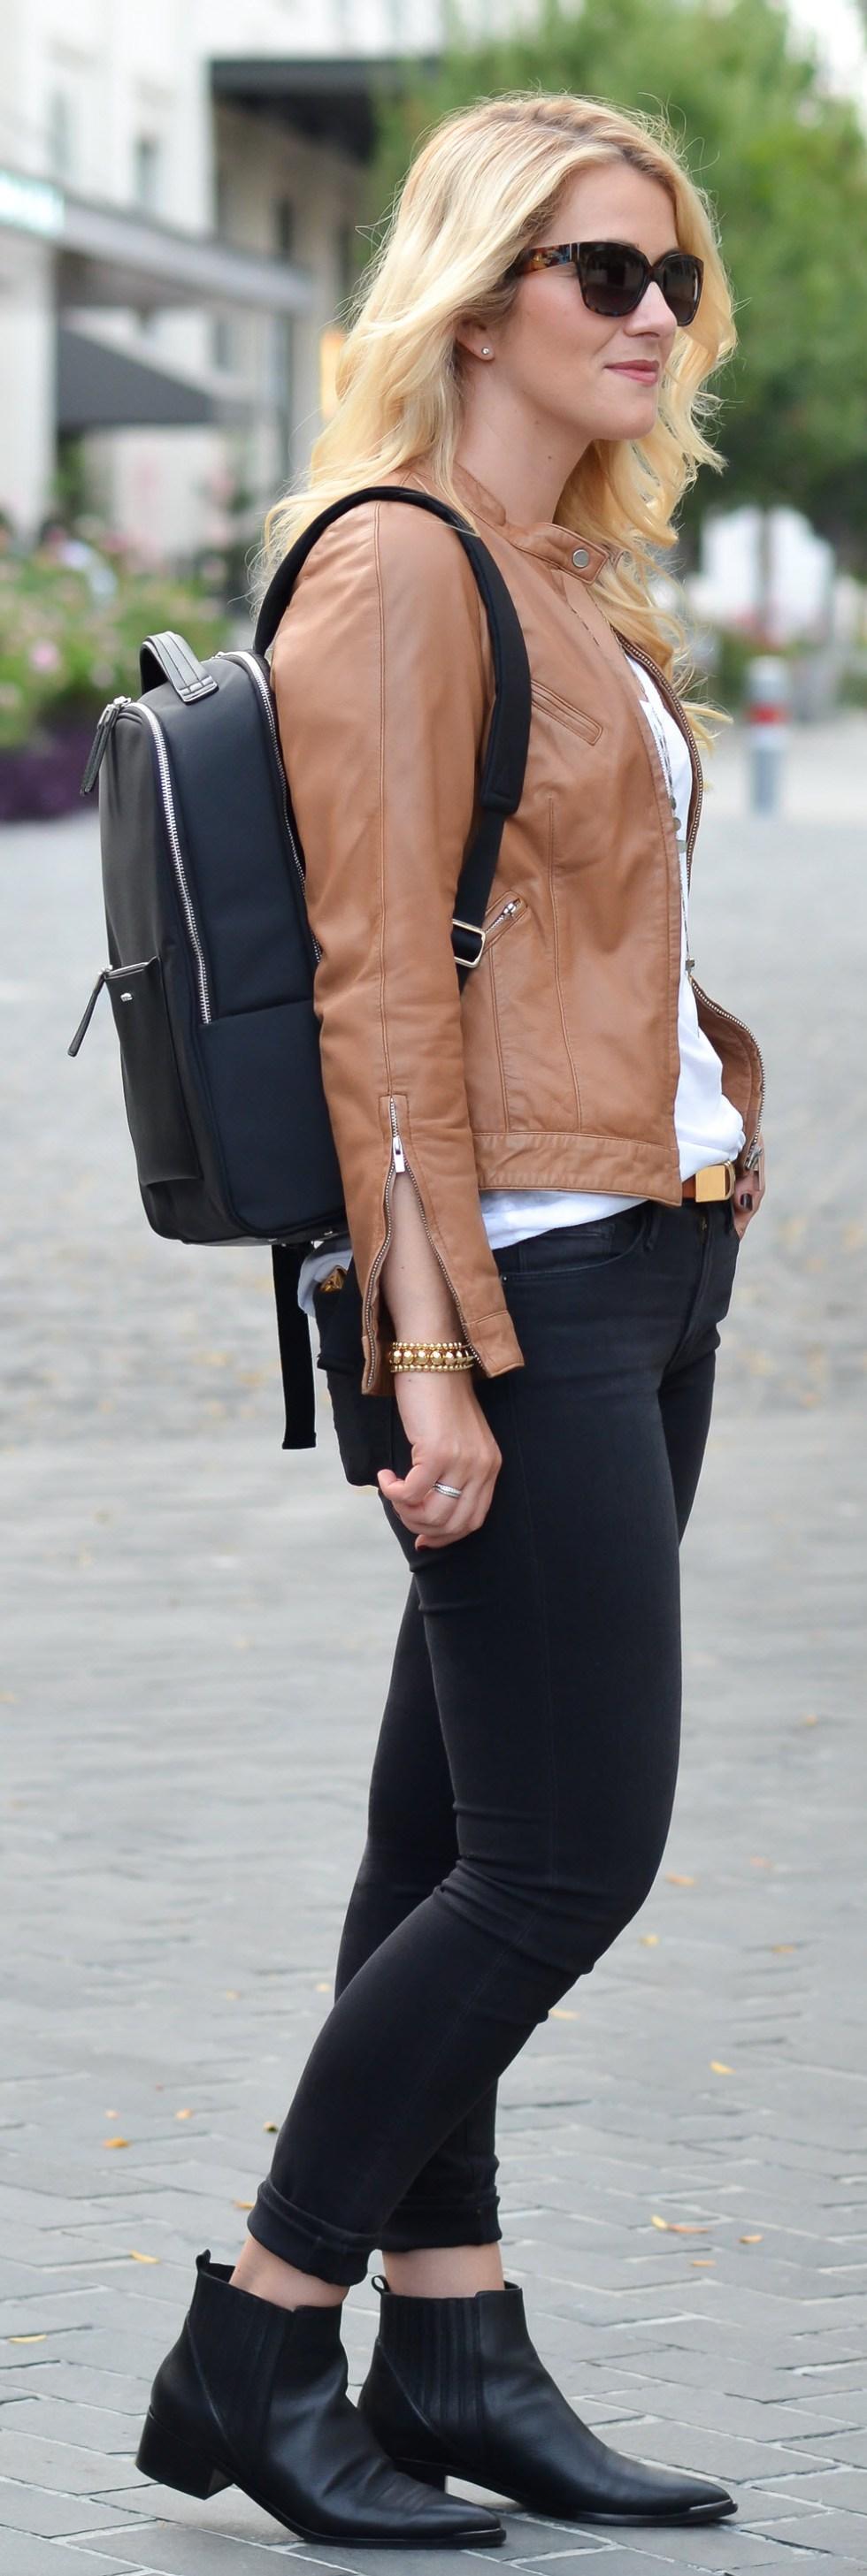 Best Travel Work Bags for Stylish Women. Chic Work Laptop Backpack - Samsonite Zalia Backpack Review